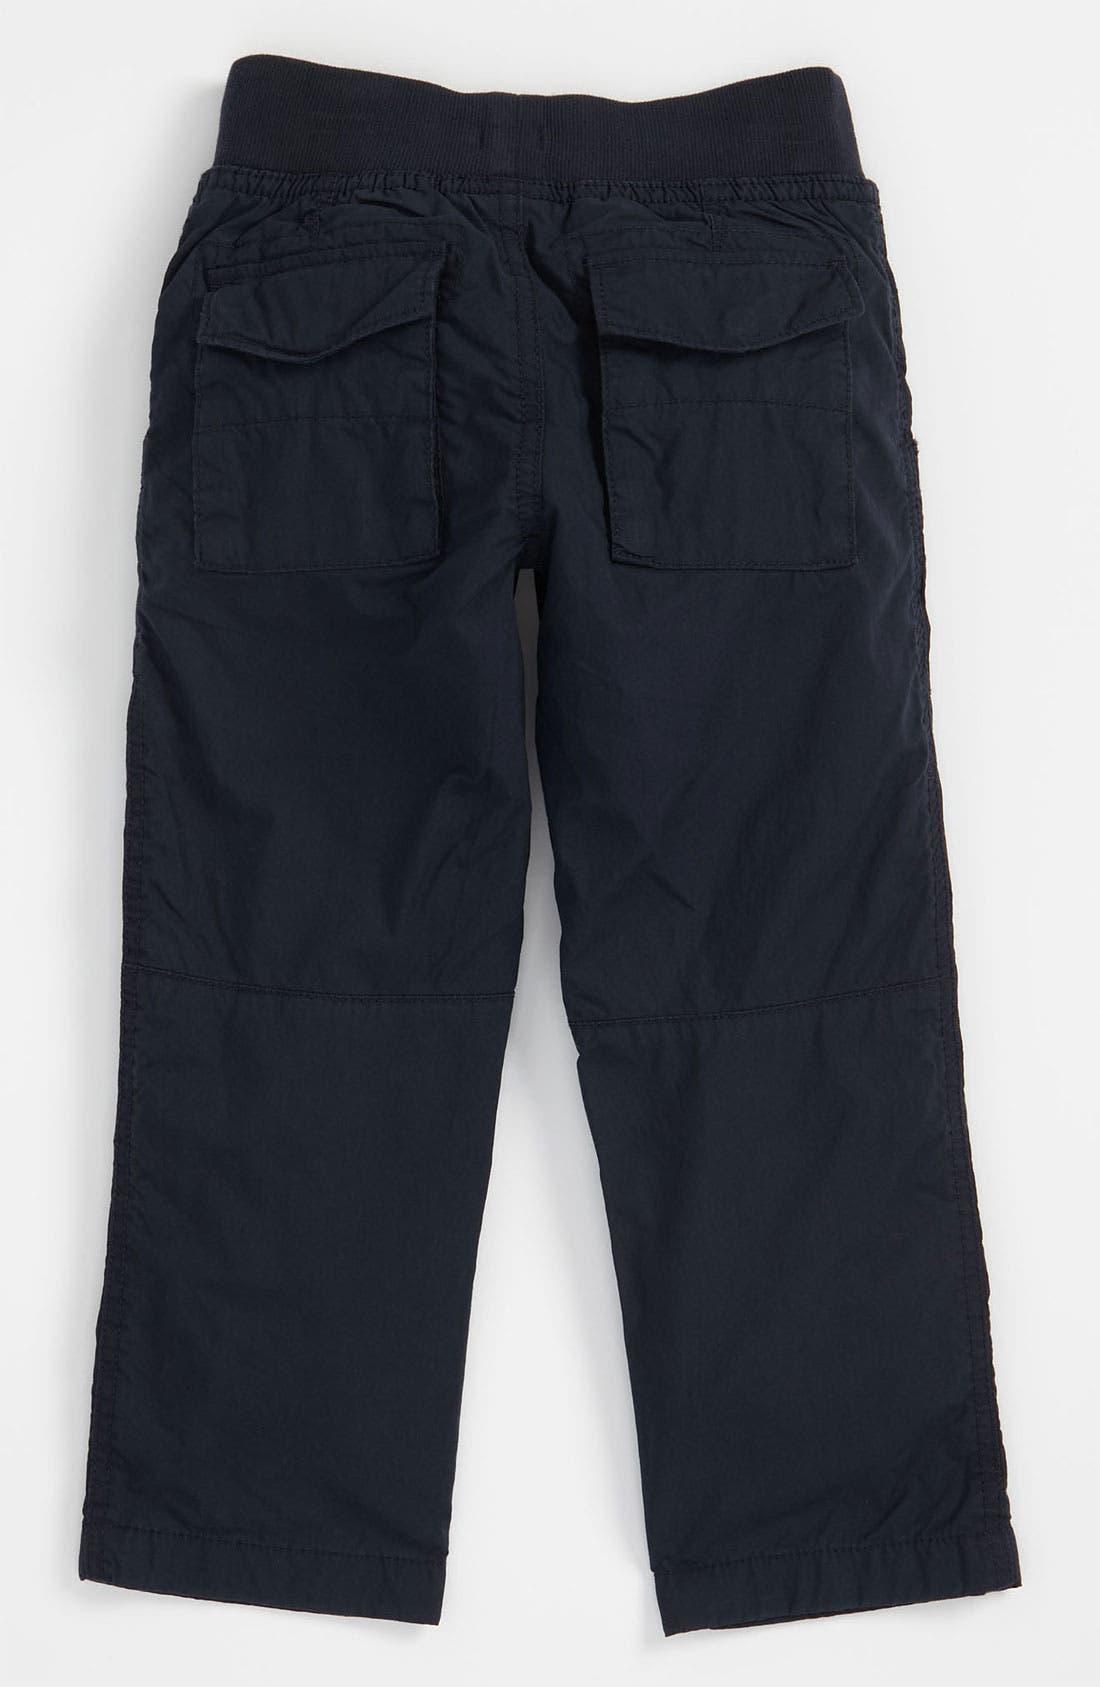 Alternate Image 2  - United Colors of Benetton Kids 'Sport' Pants (Toddler)